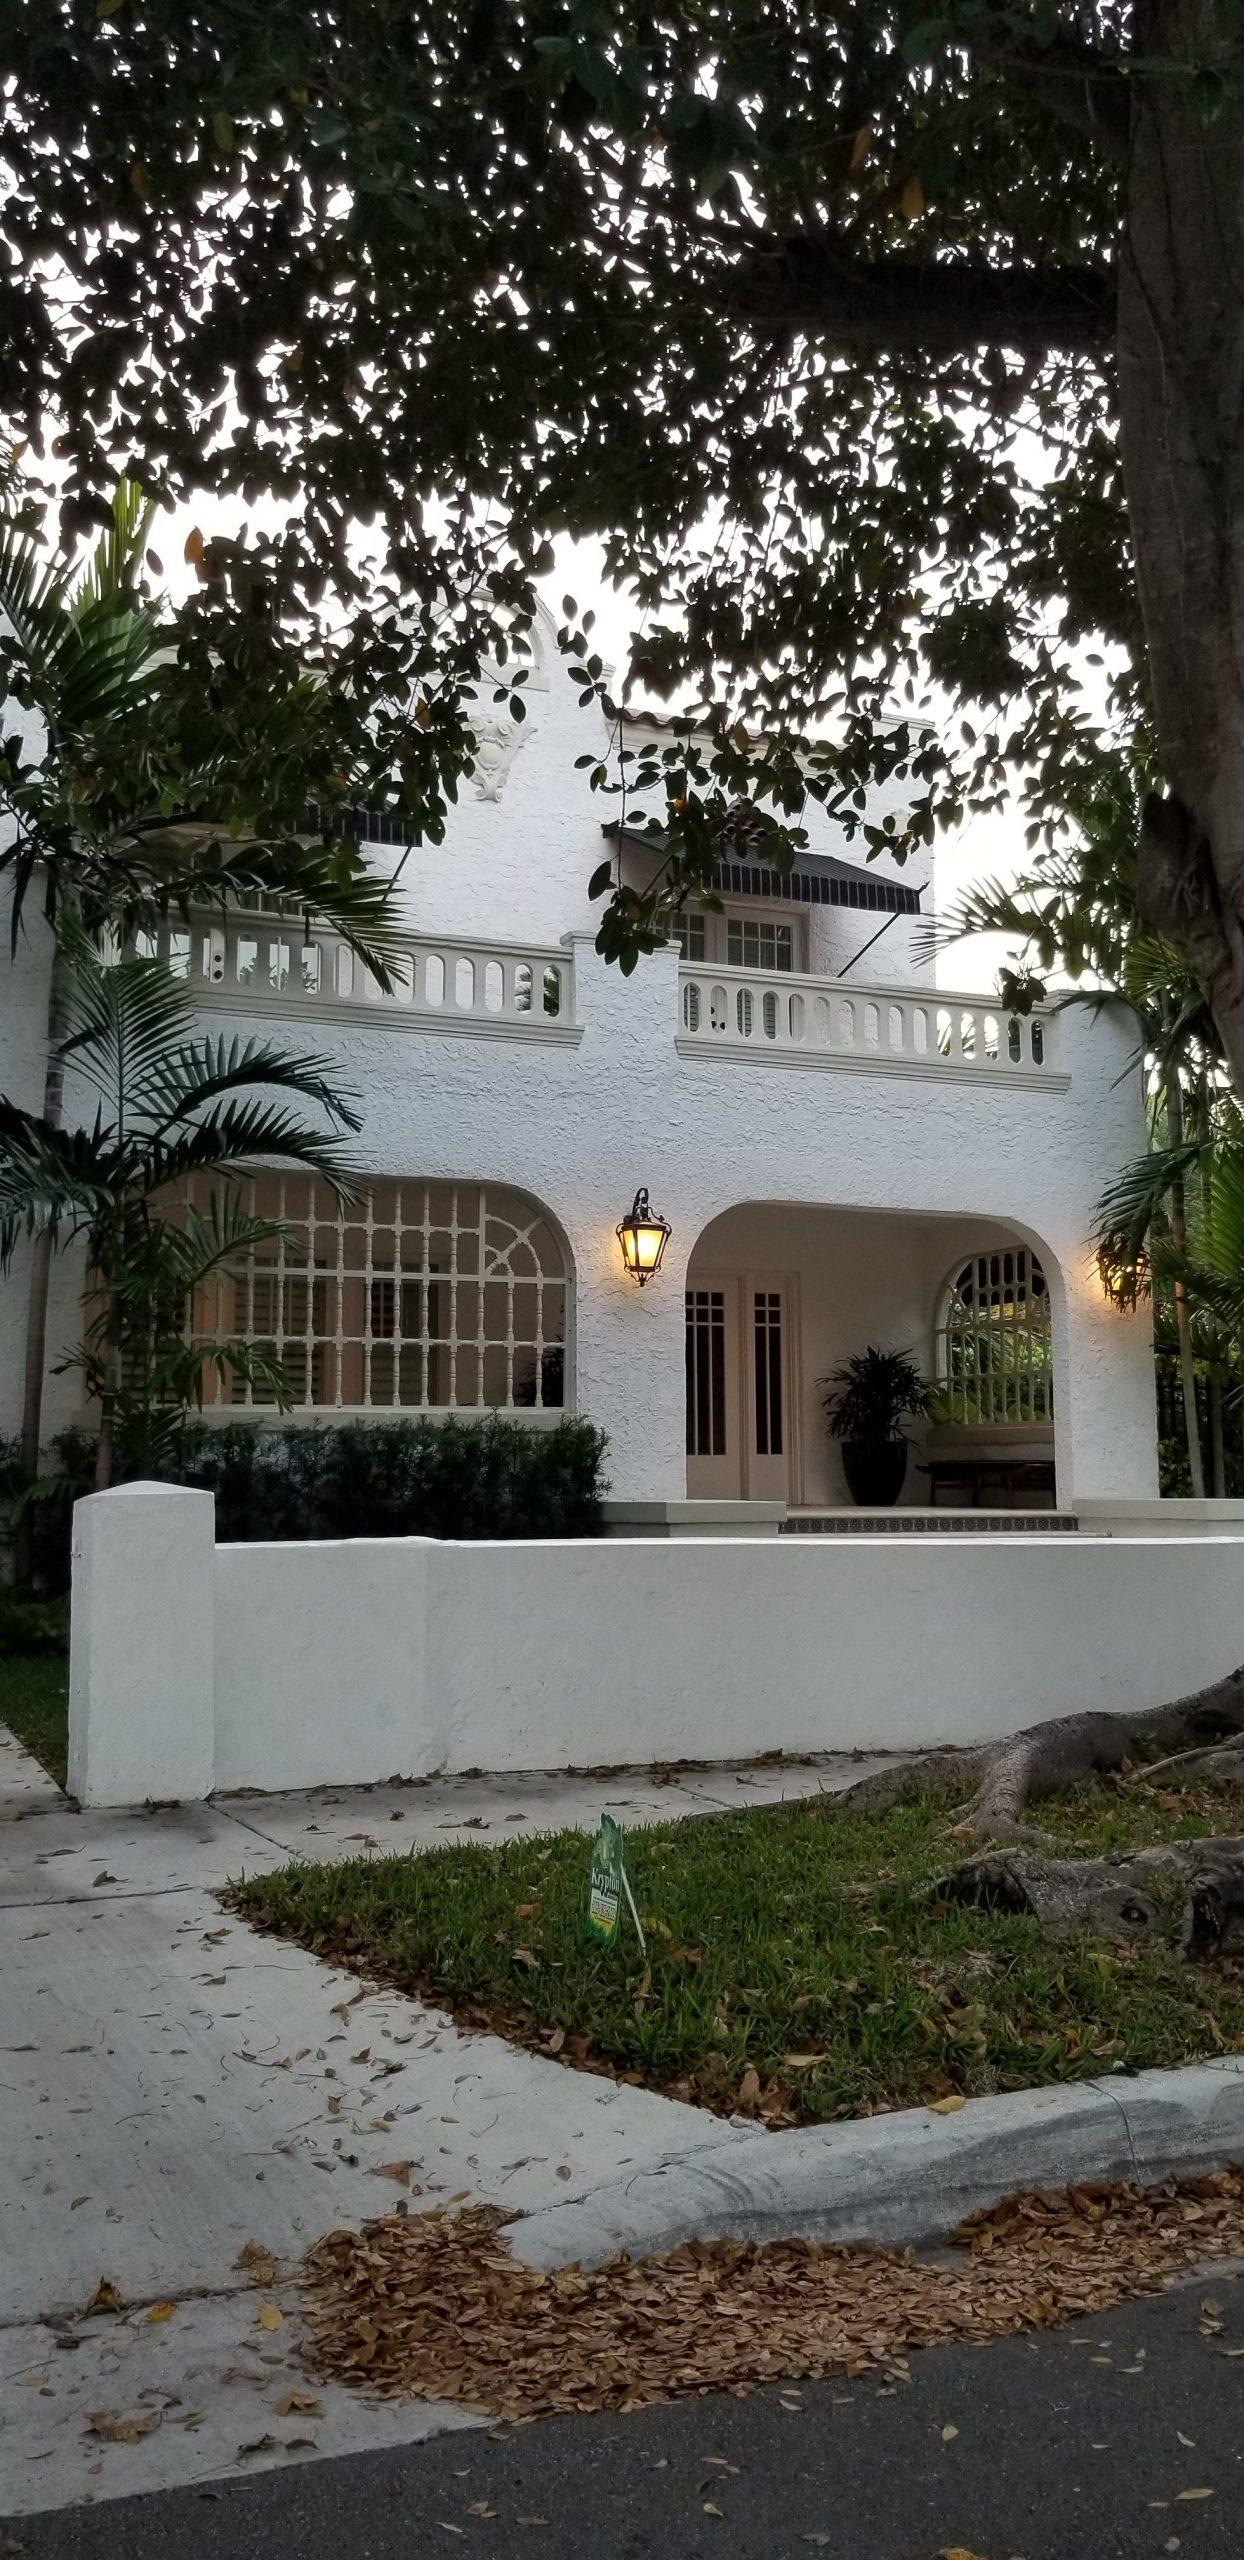 Hme 1 e1555437415882 scaled - Shenandoah, un pintoresco barrio ubicado en los predios de la Pequeña Habana